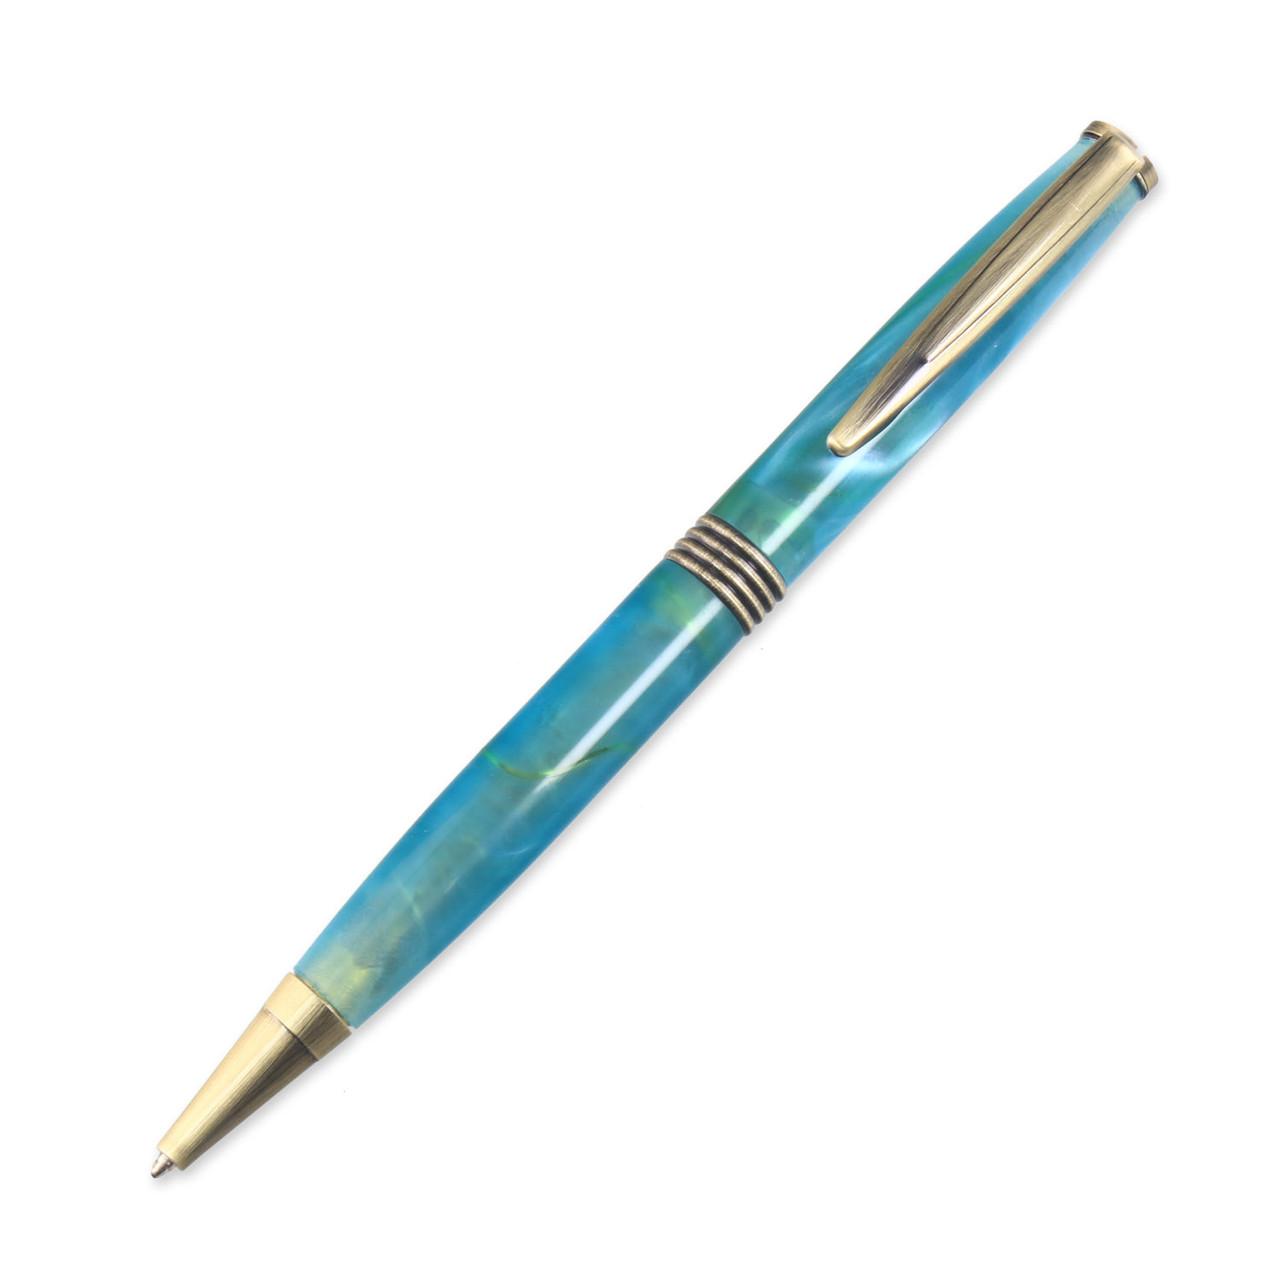 Legacy Streamline Pen Kit - Antique Bronze